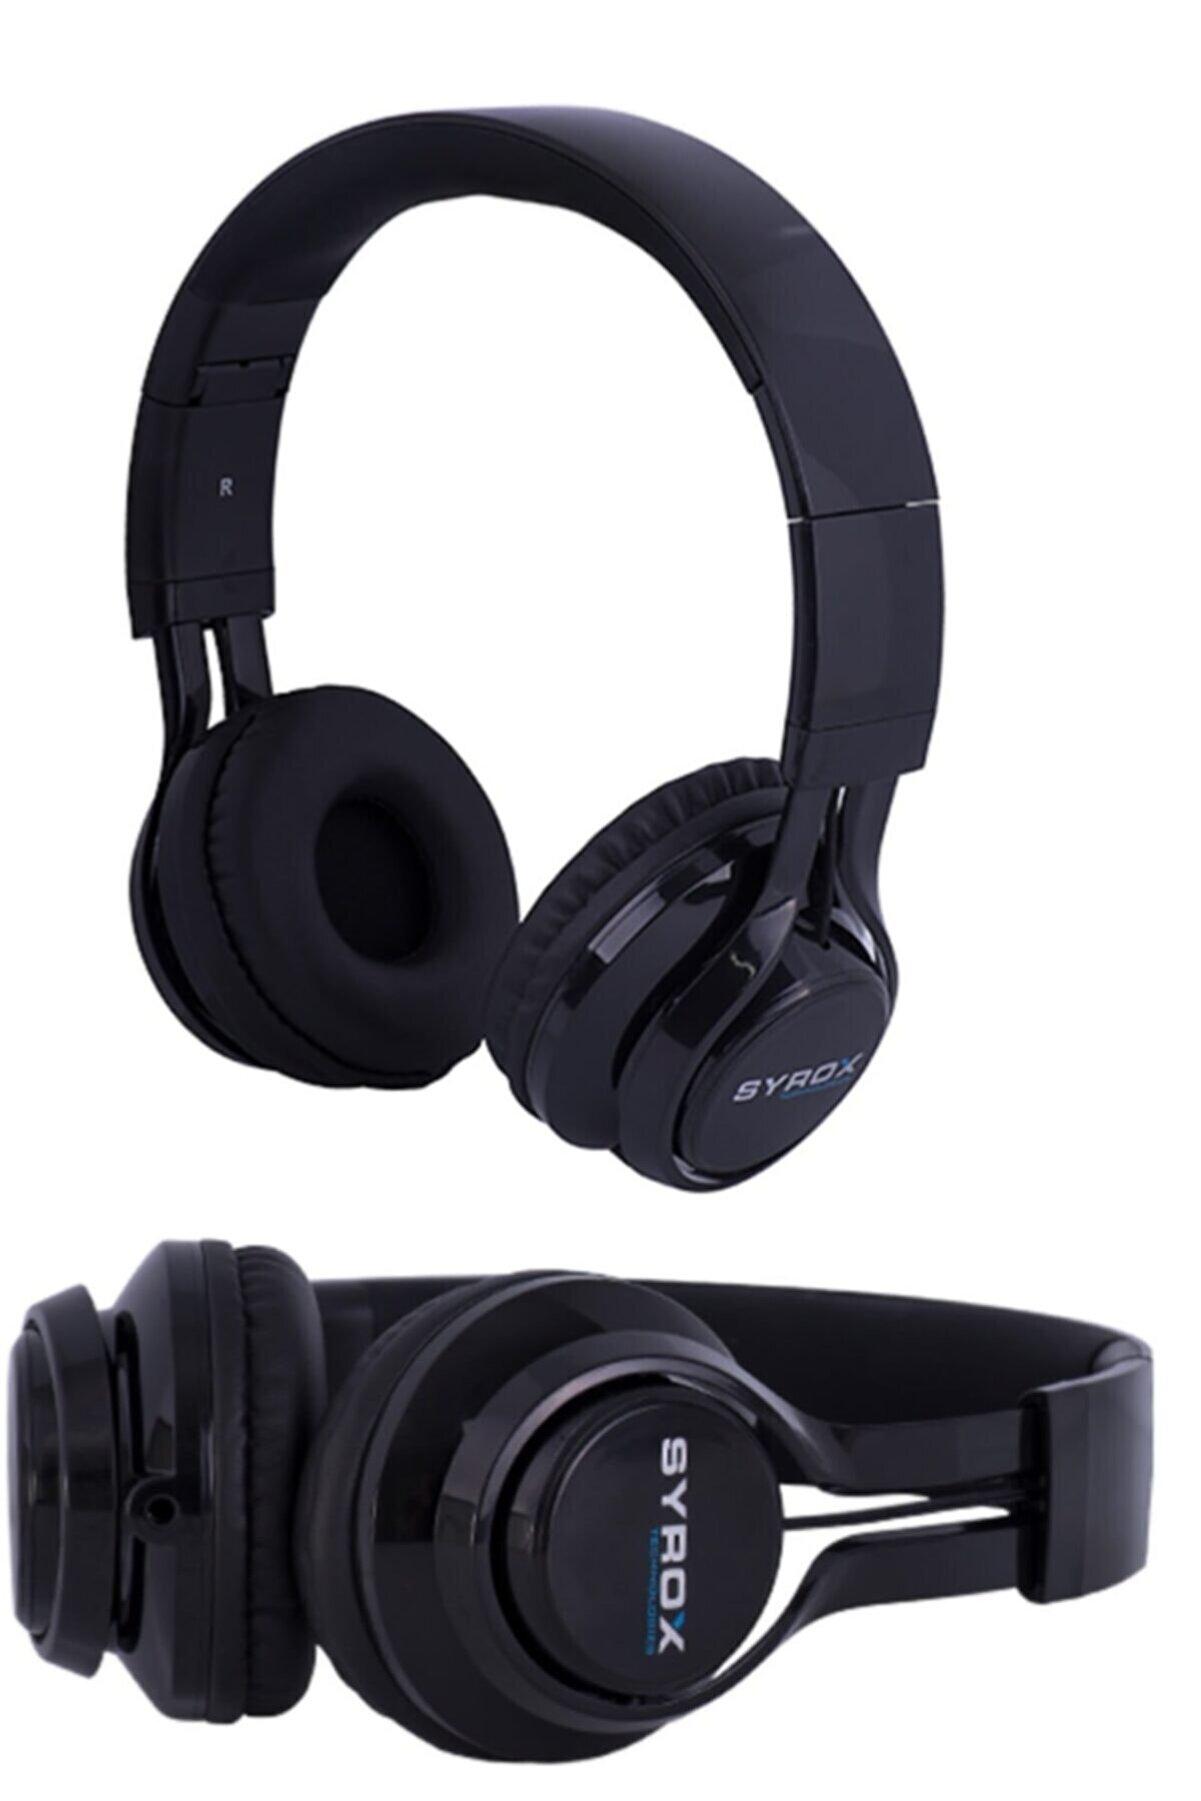 Syrox Kulaküstü Mikrofonlu Aux Kablolu Kulaklık